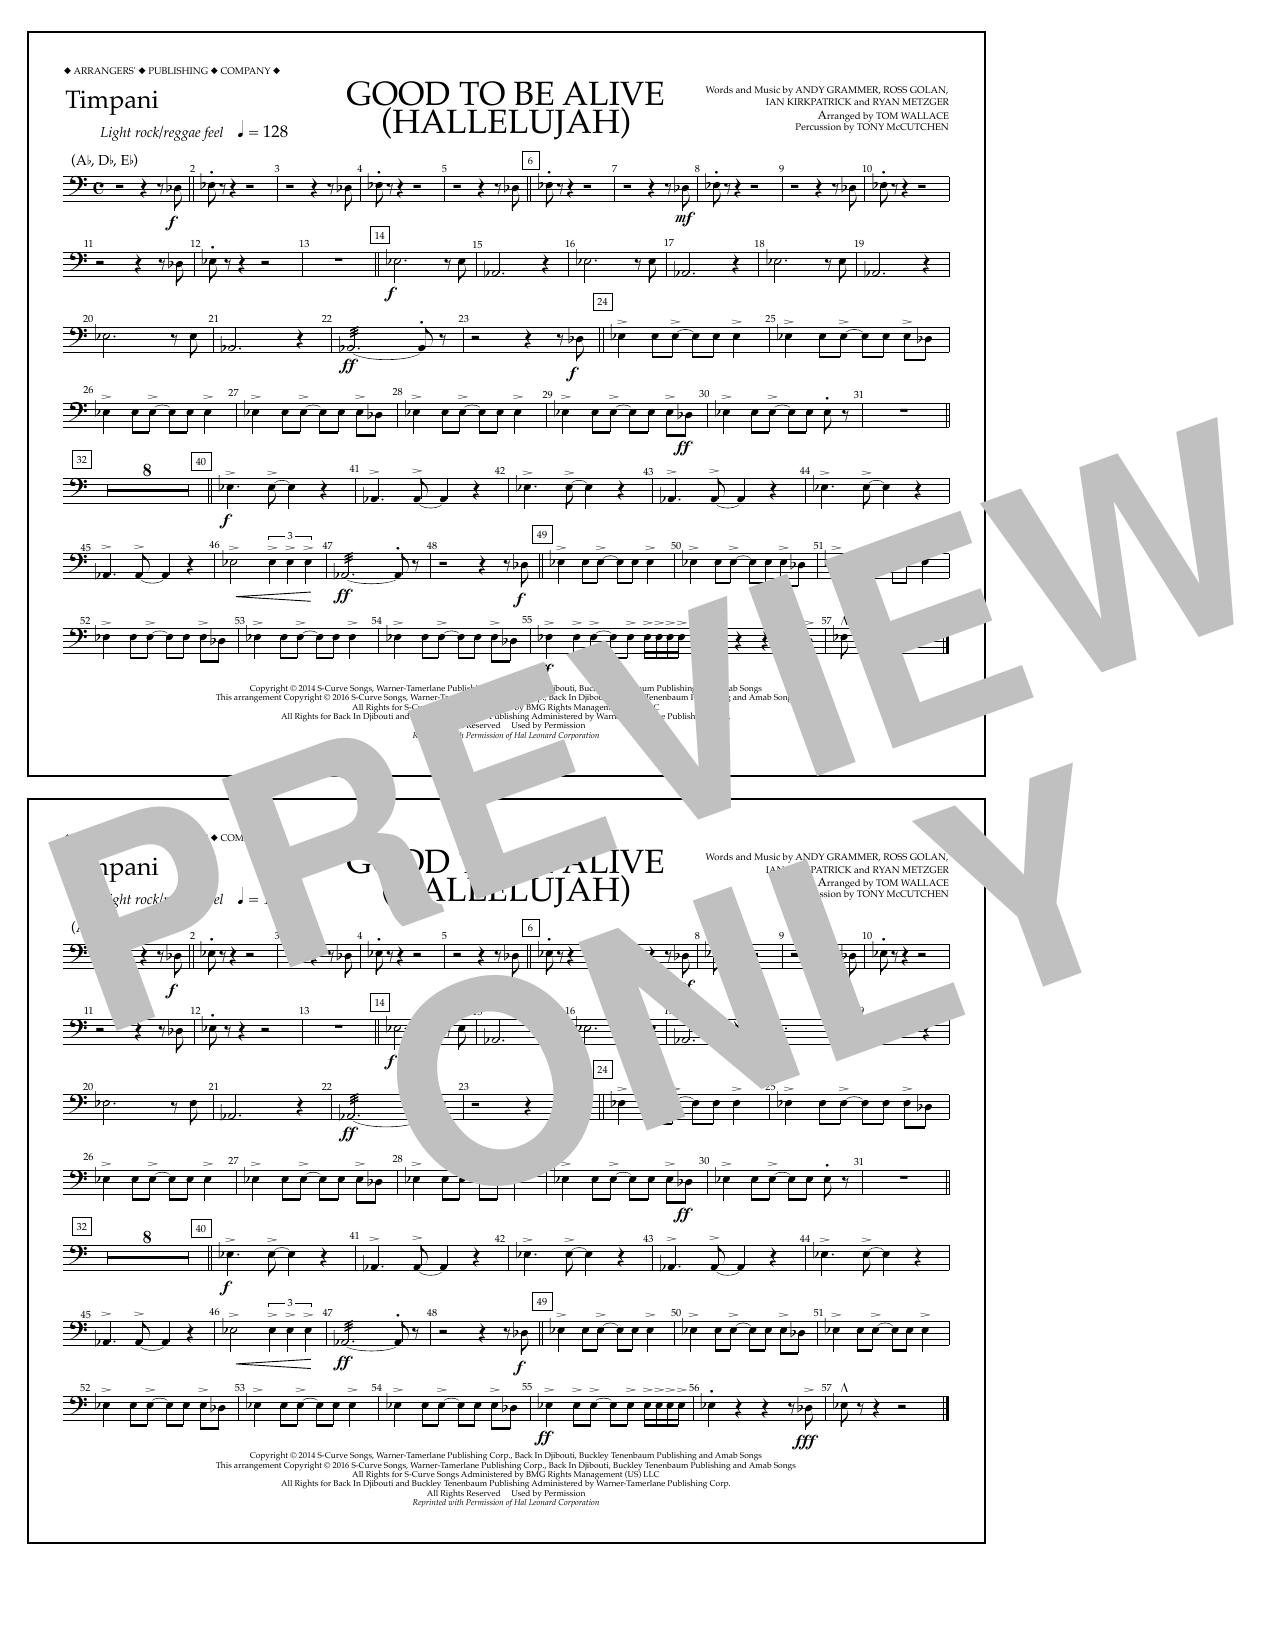 Good to Be Alive (Hallelujah) - Timpani Sheet Music